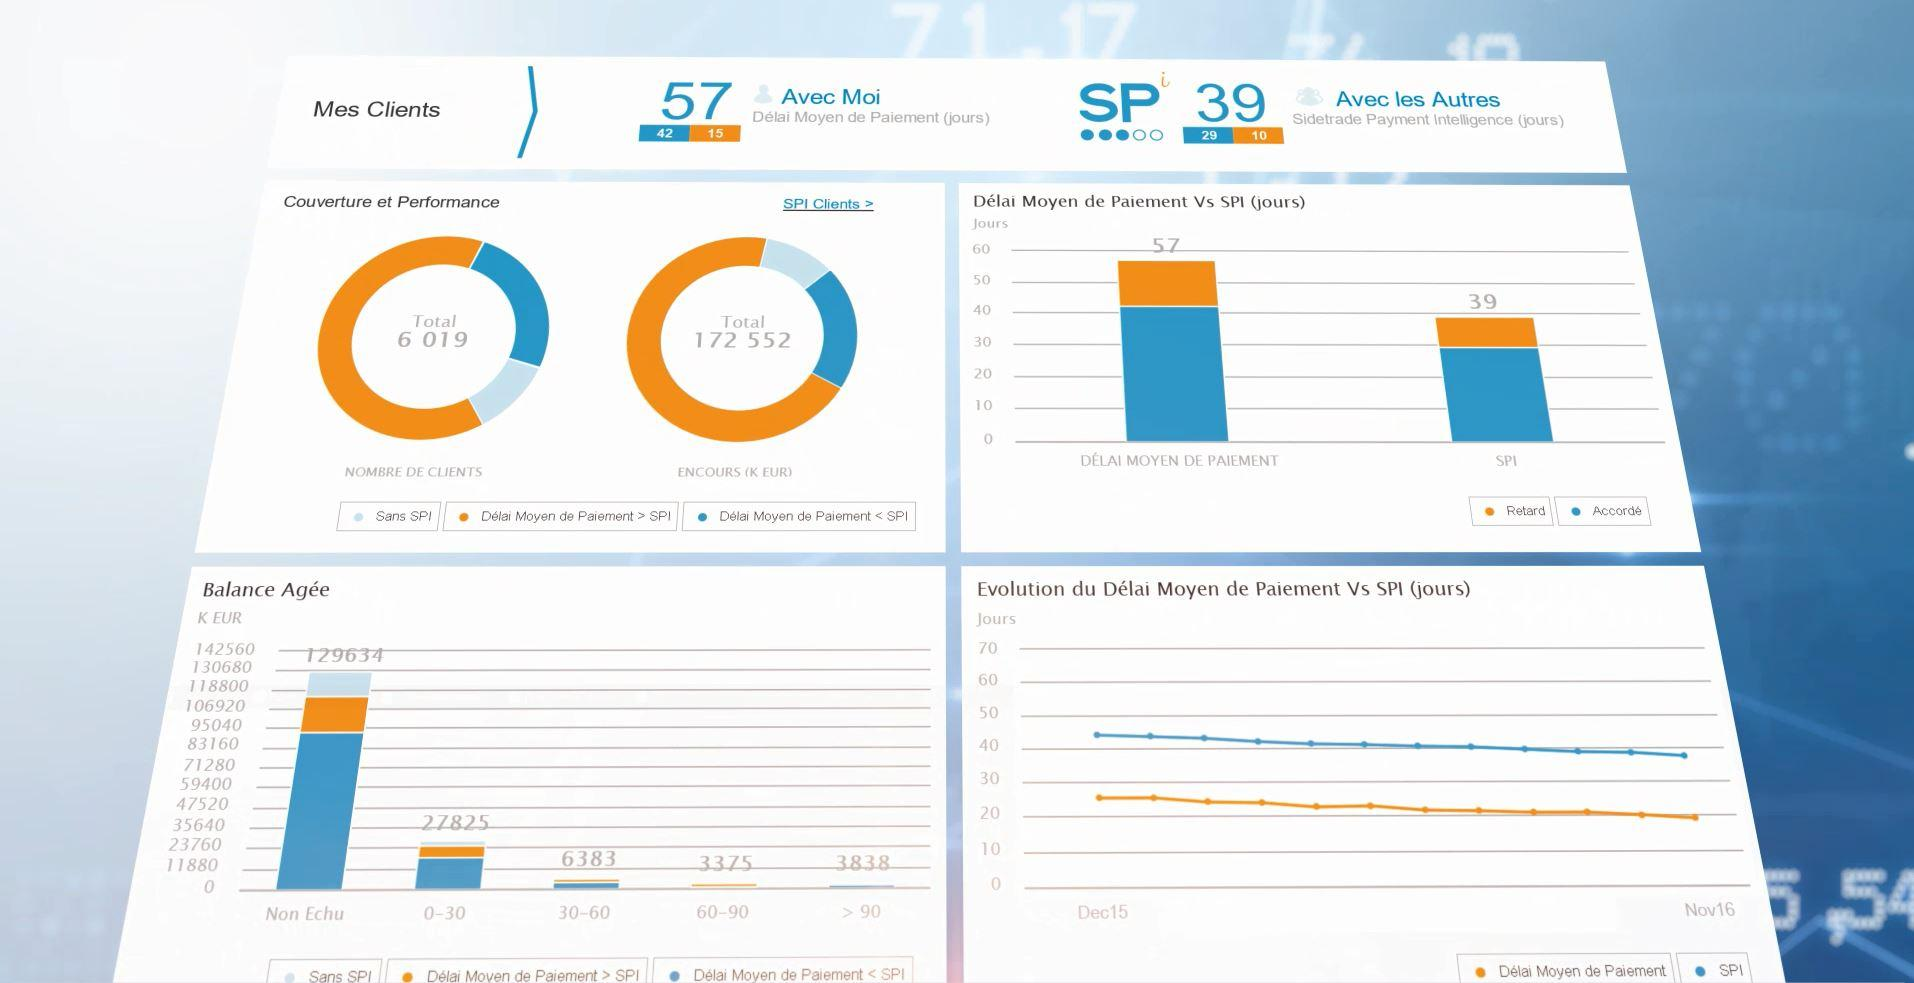 Sidetrade Sales & Marketing-Sidetrade Payment Intelligence - screen shot  5